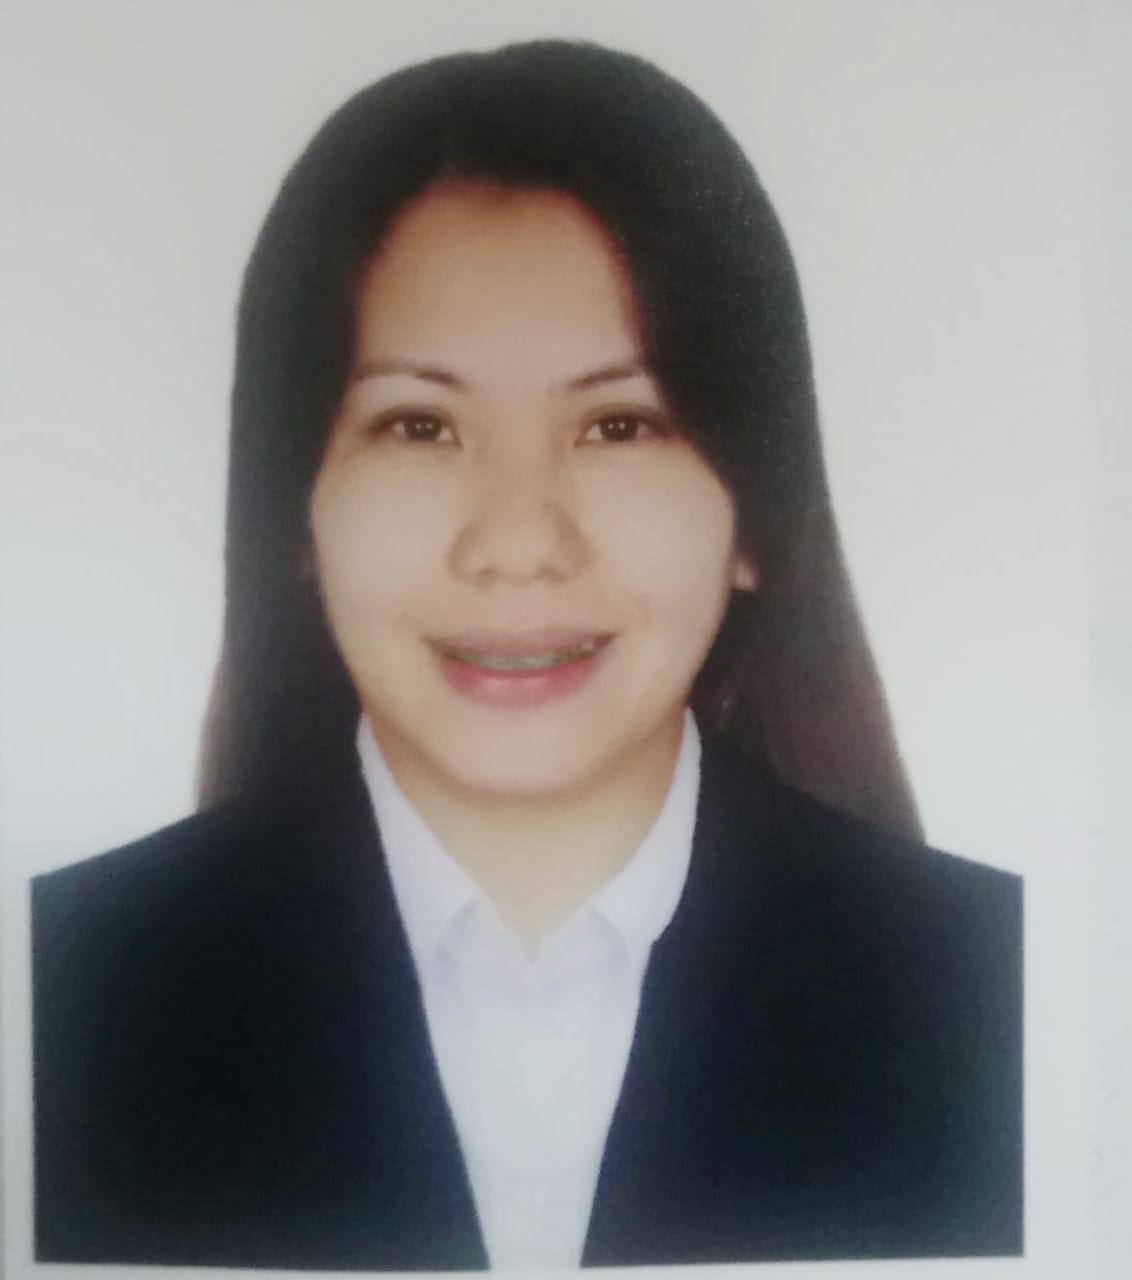 Patricia balalang padua picture_IM_2019031611140716.jpg